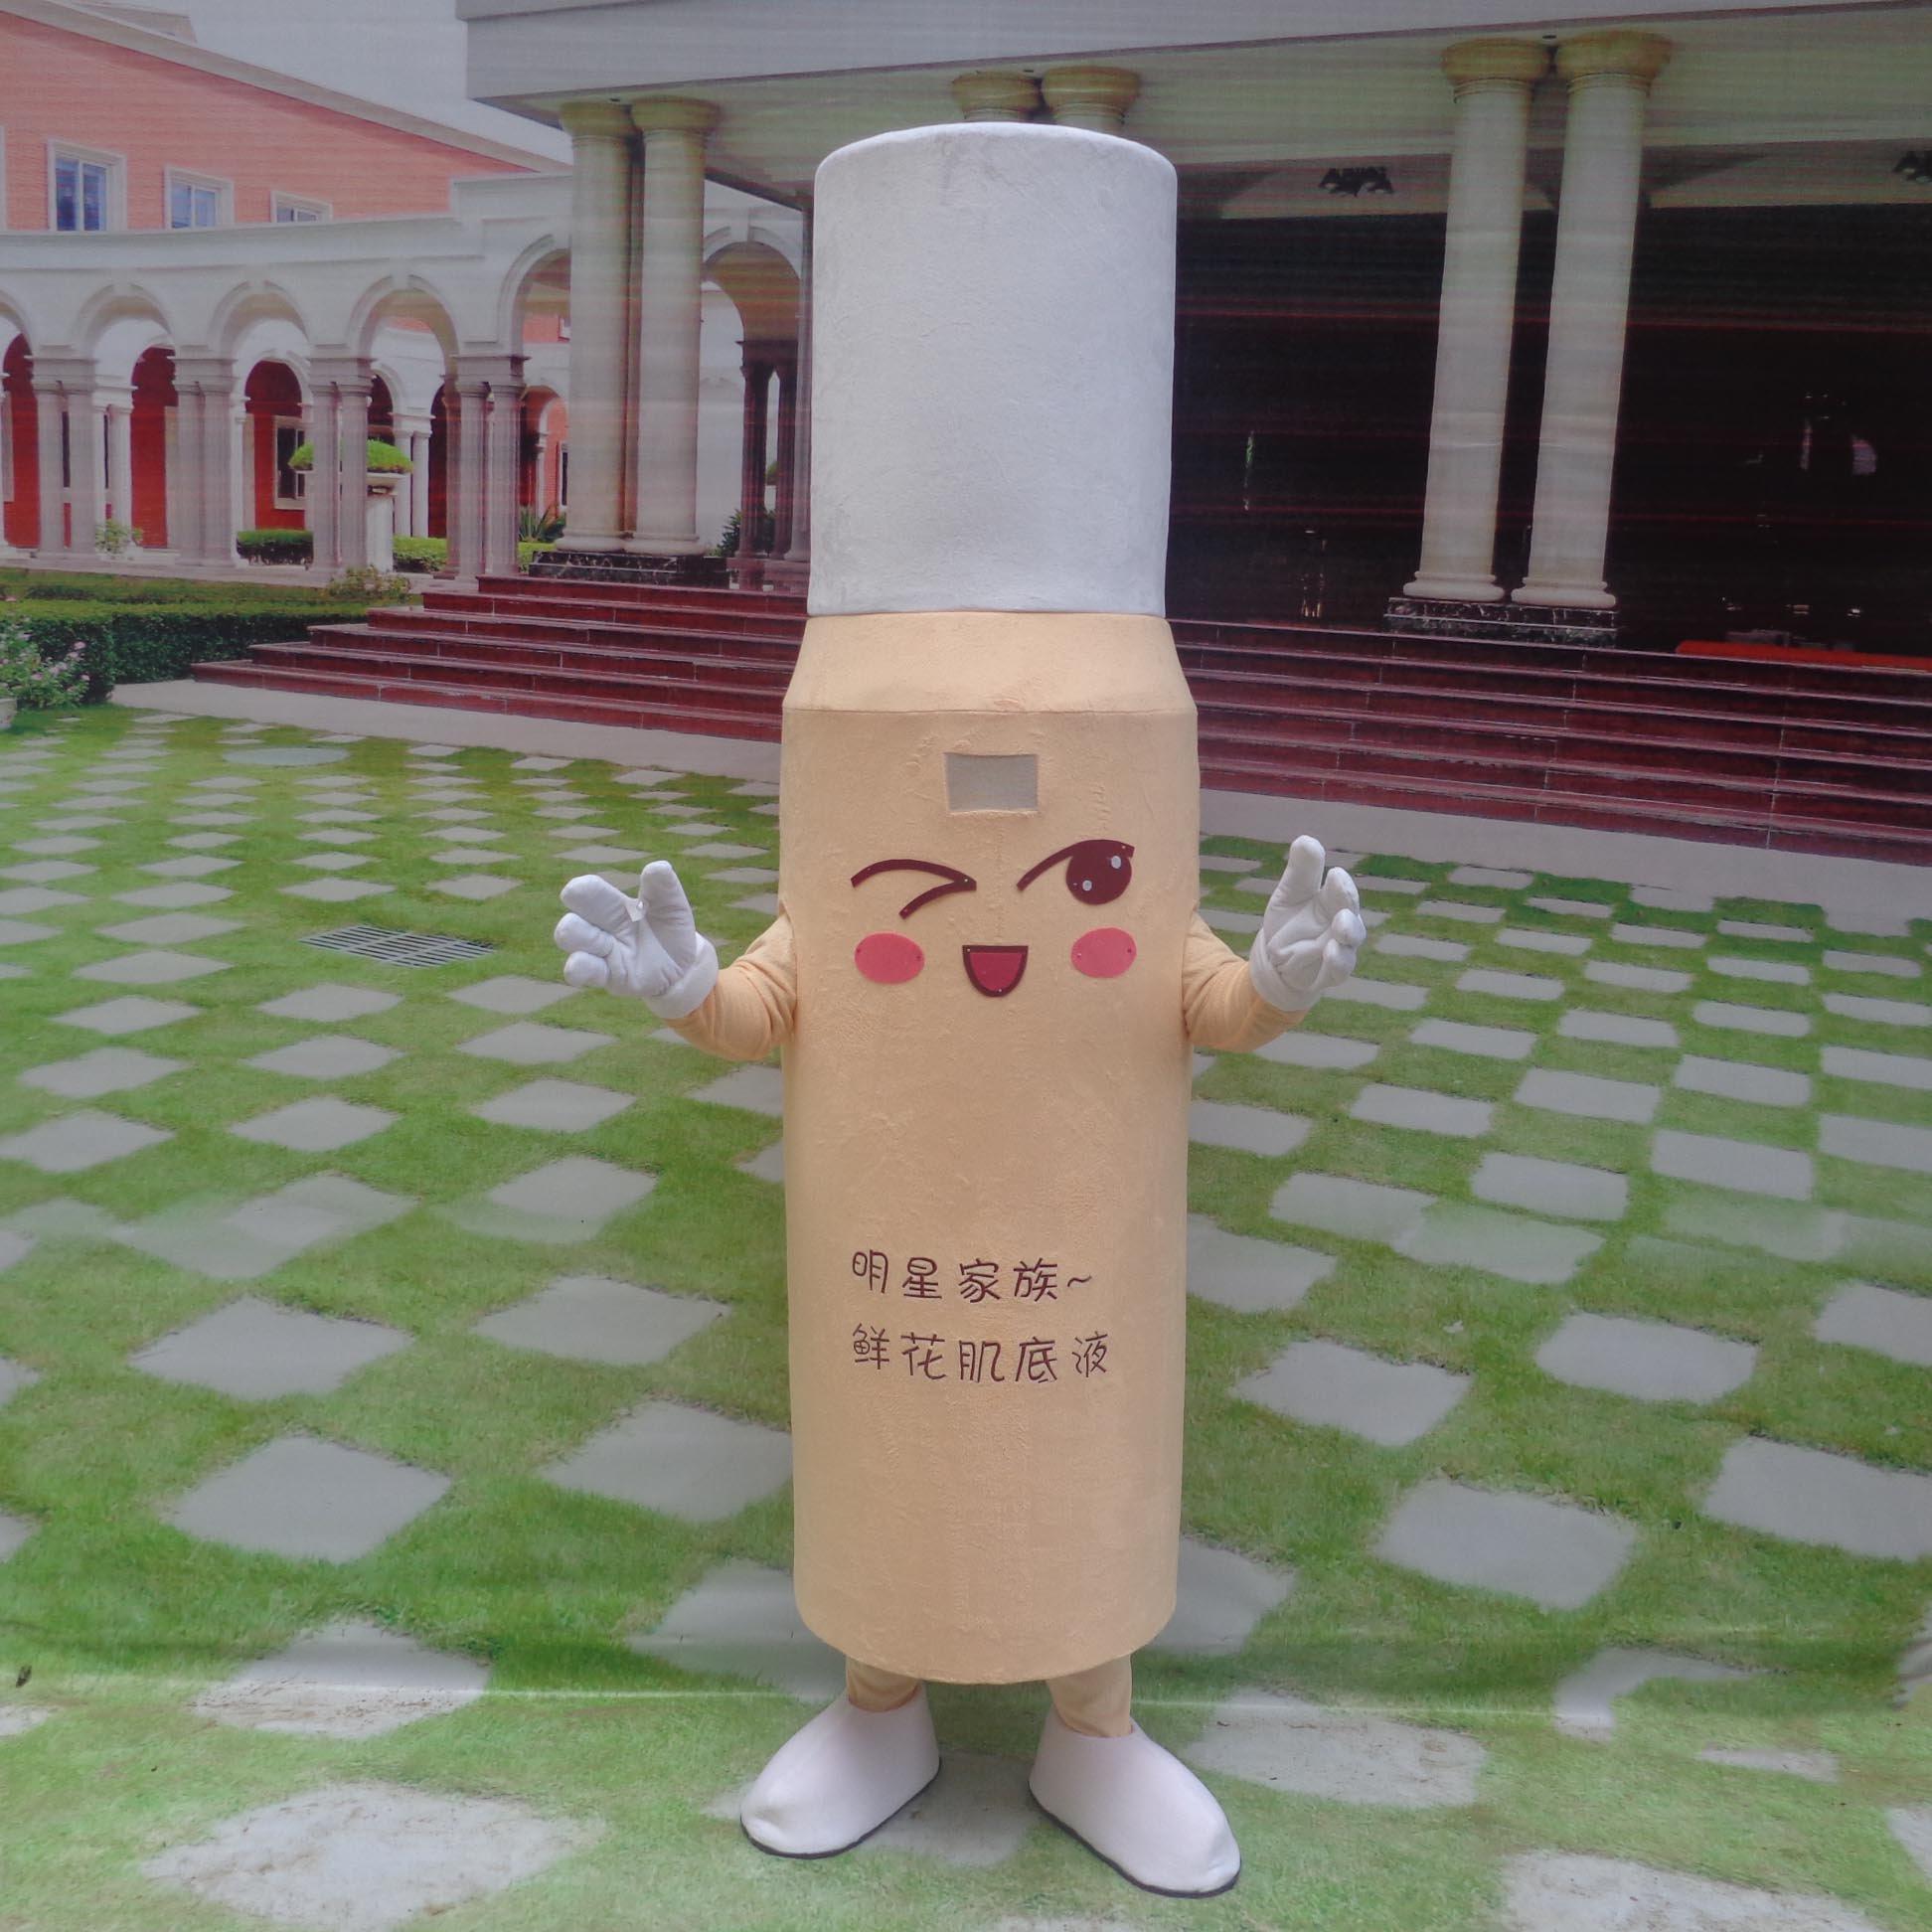 Cosmetics Cartoon Doll Clothing Cartoon Walking Doll Clothing Companies Advertising Mascot Mascot Costume